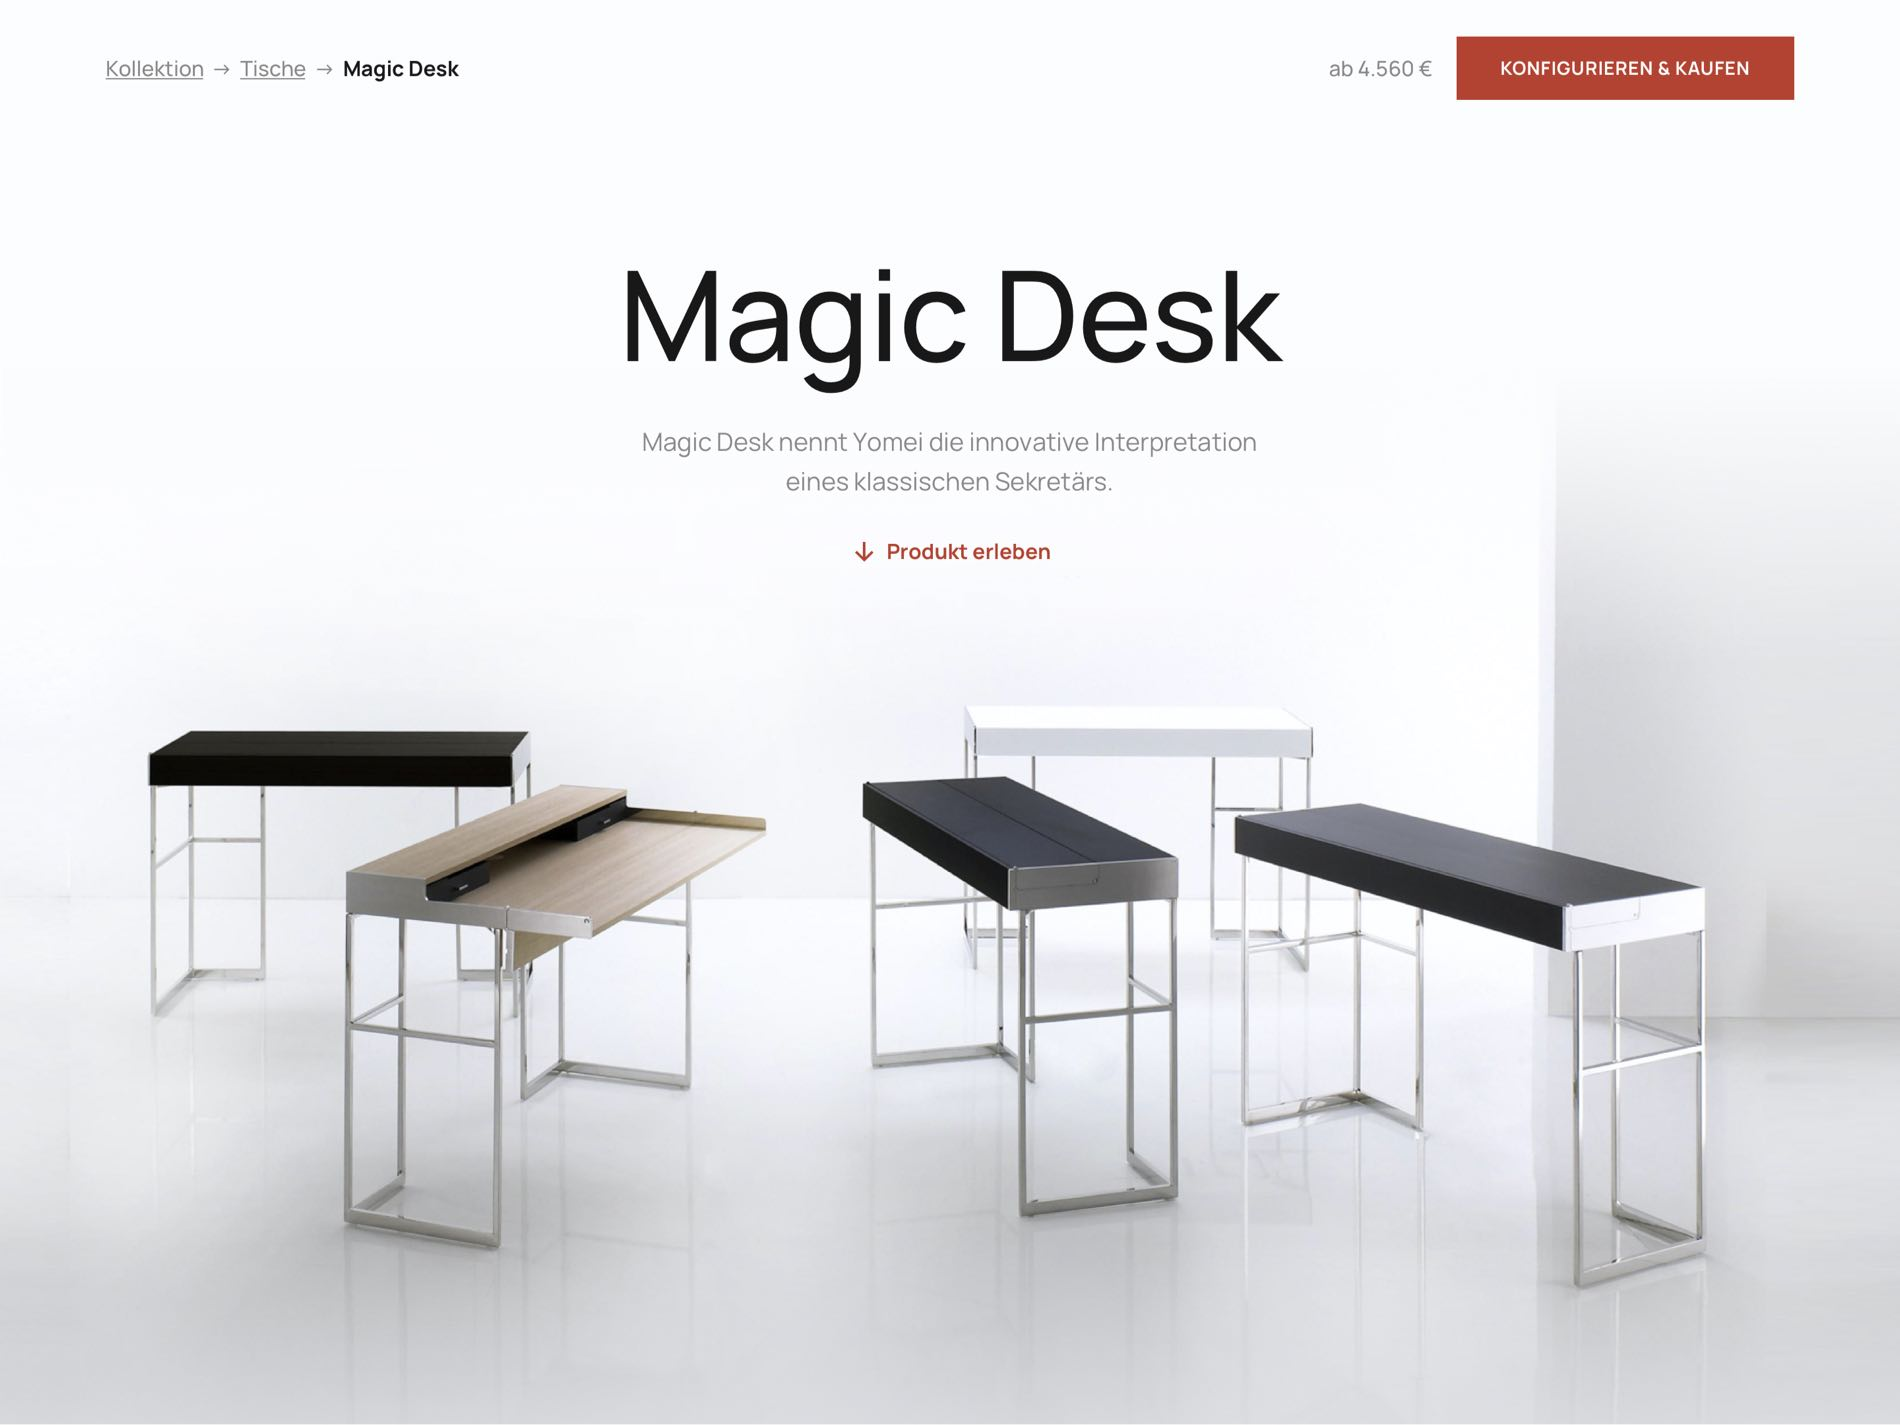 Yomei Magic Desk Website Layout Screenshot